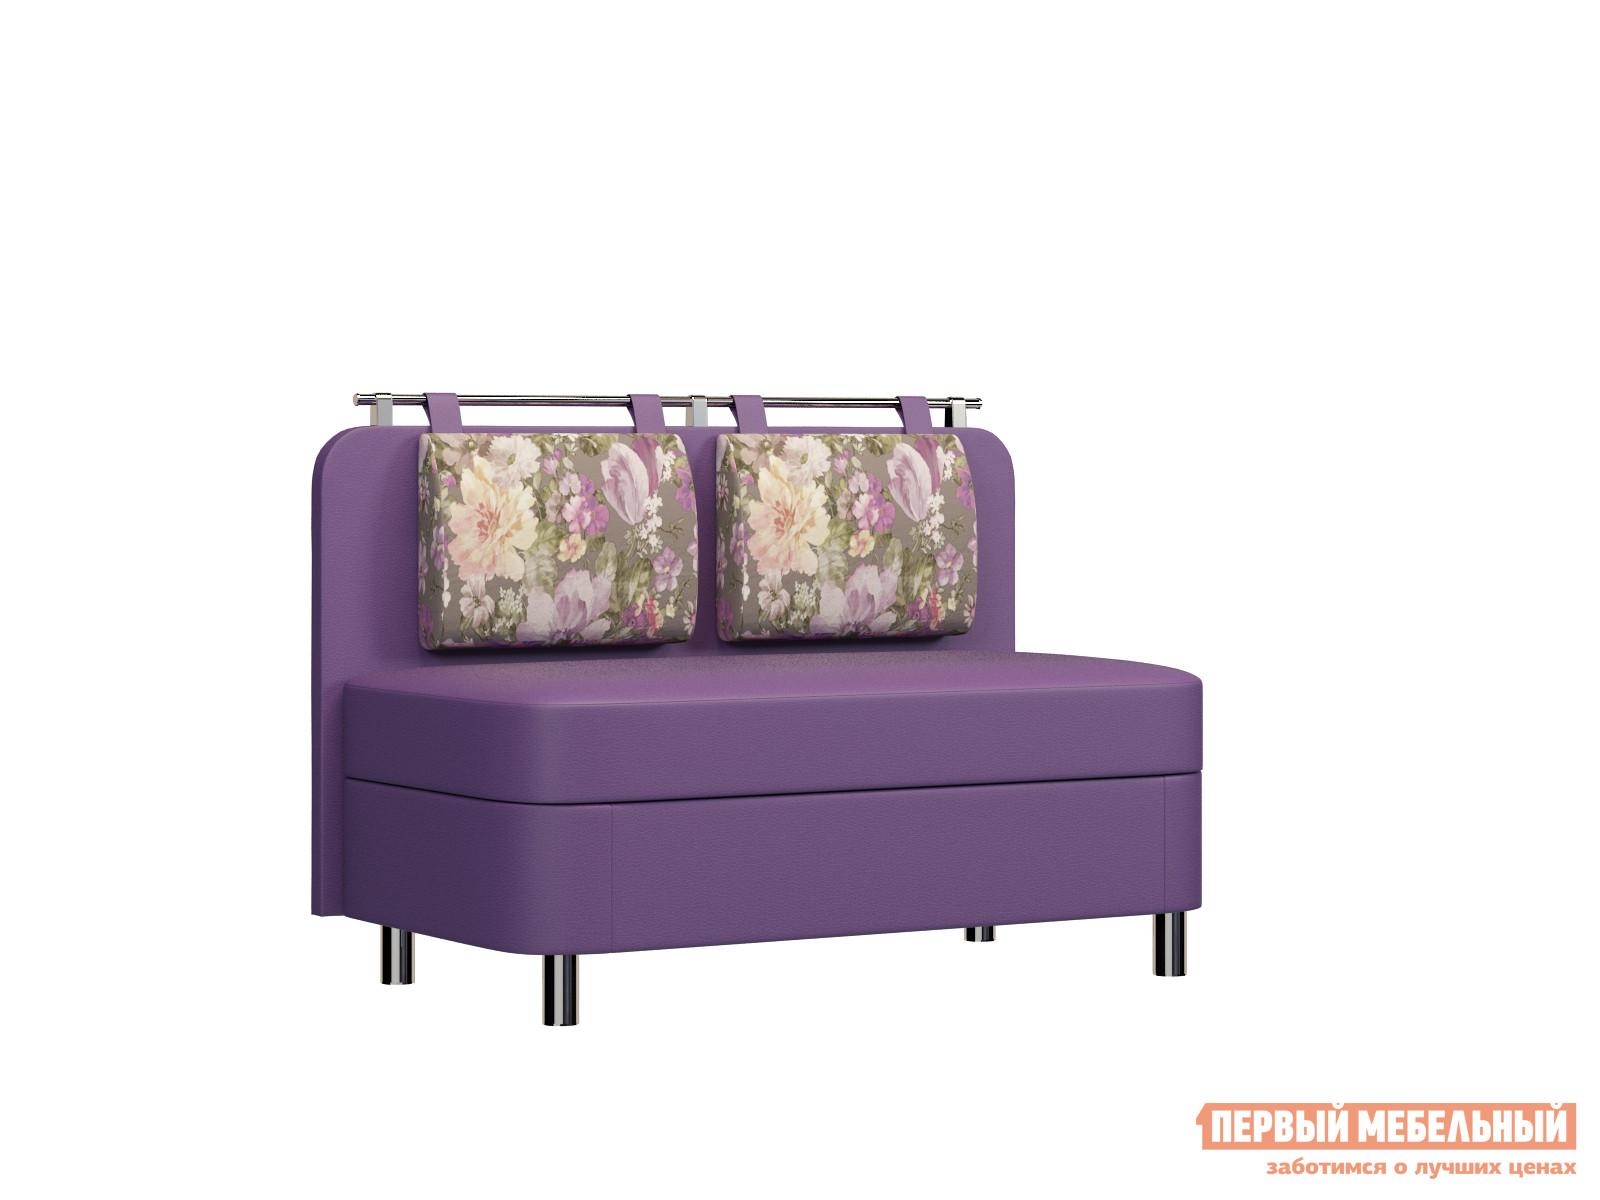 Мягкий узкий мини диван на кухню двухместный Вудэкспорт Лагуна М5